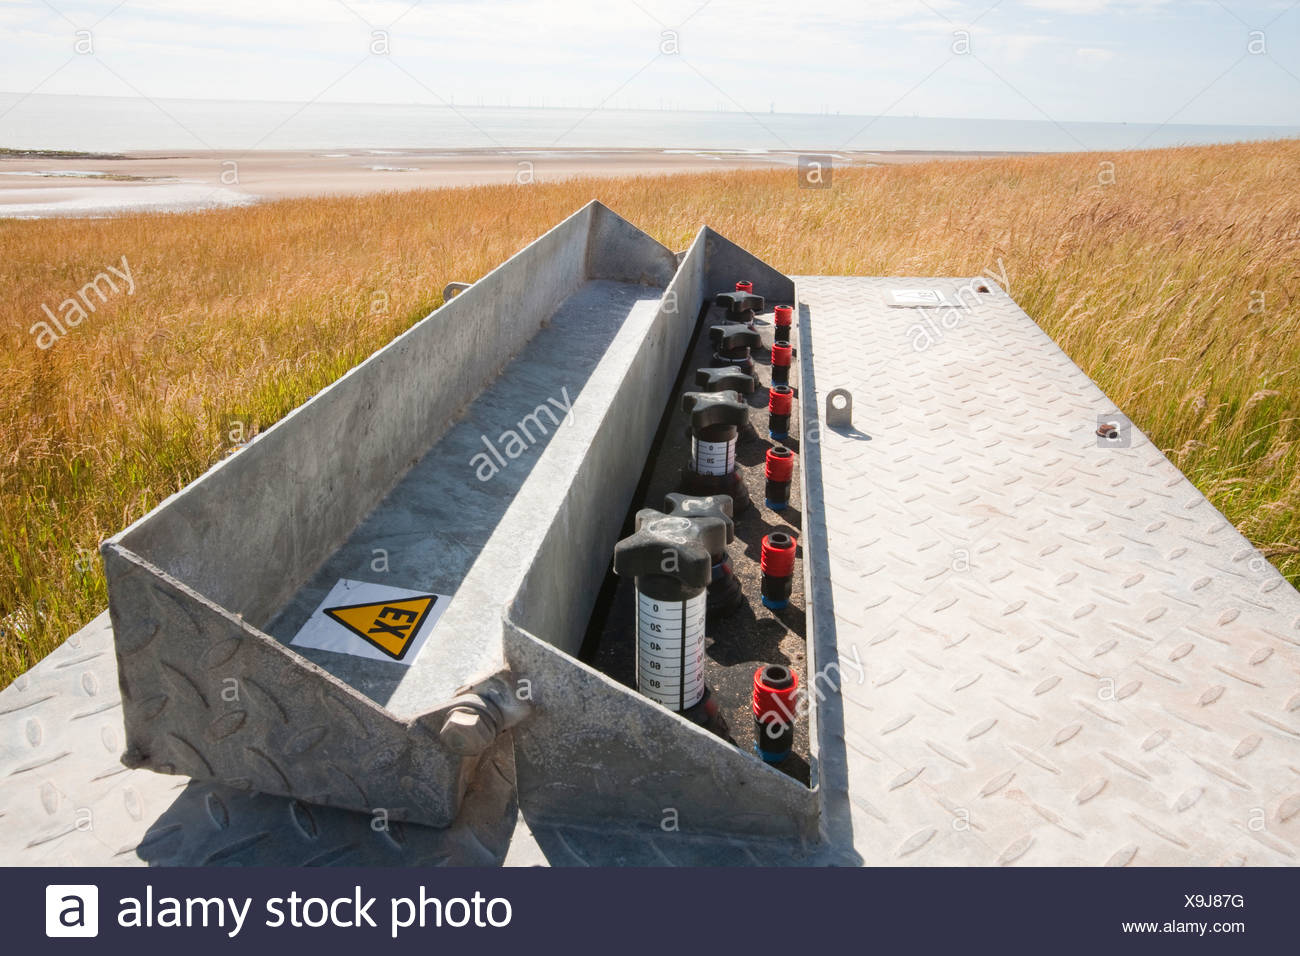 Off shore wind farm and methane capture from Landfill, Walney Island, Cumbria, UK. - Stock Image